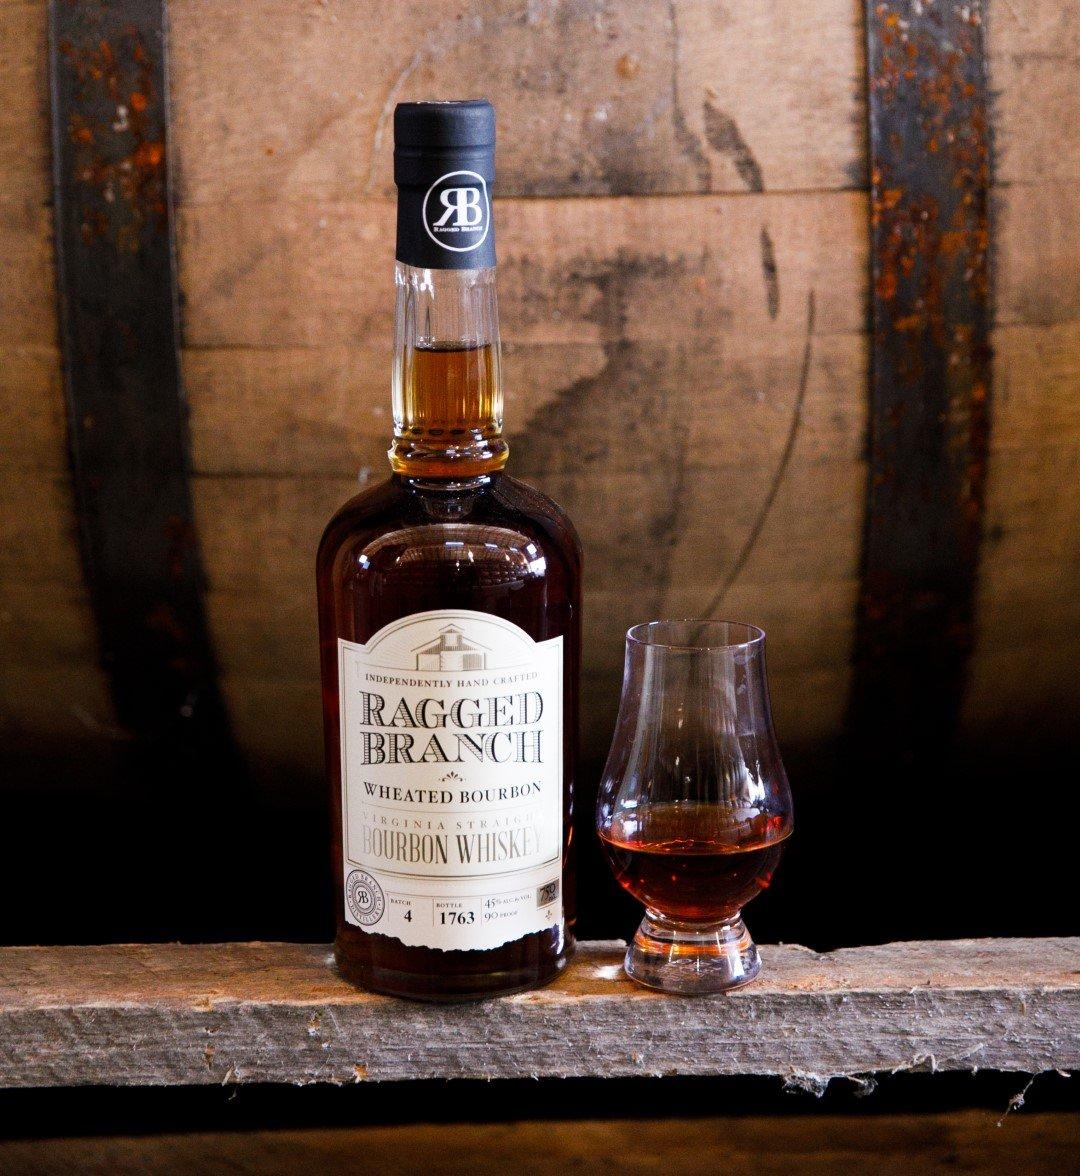 Ragged Branch Wheated Bourbon